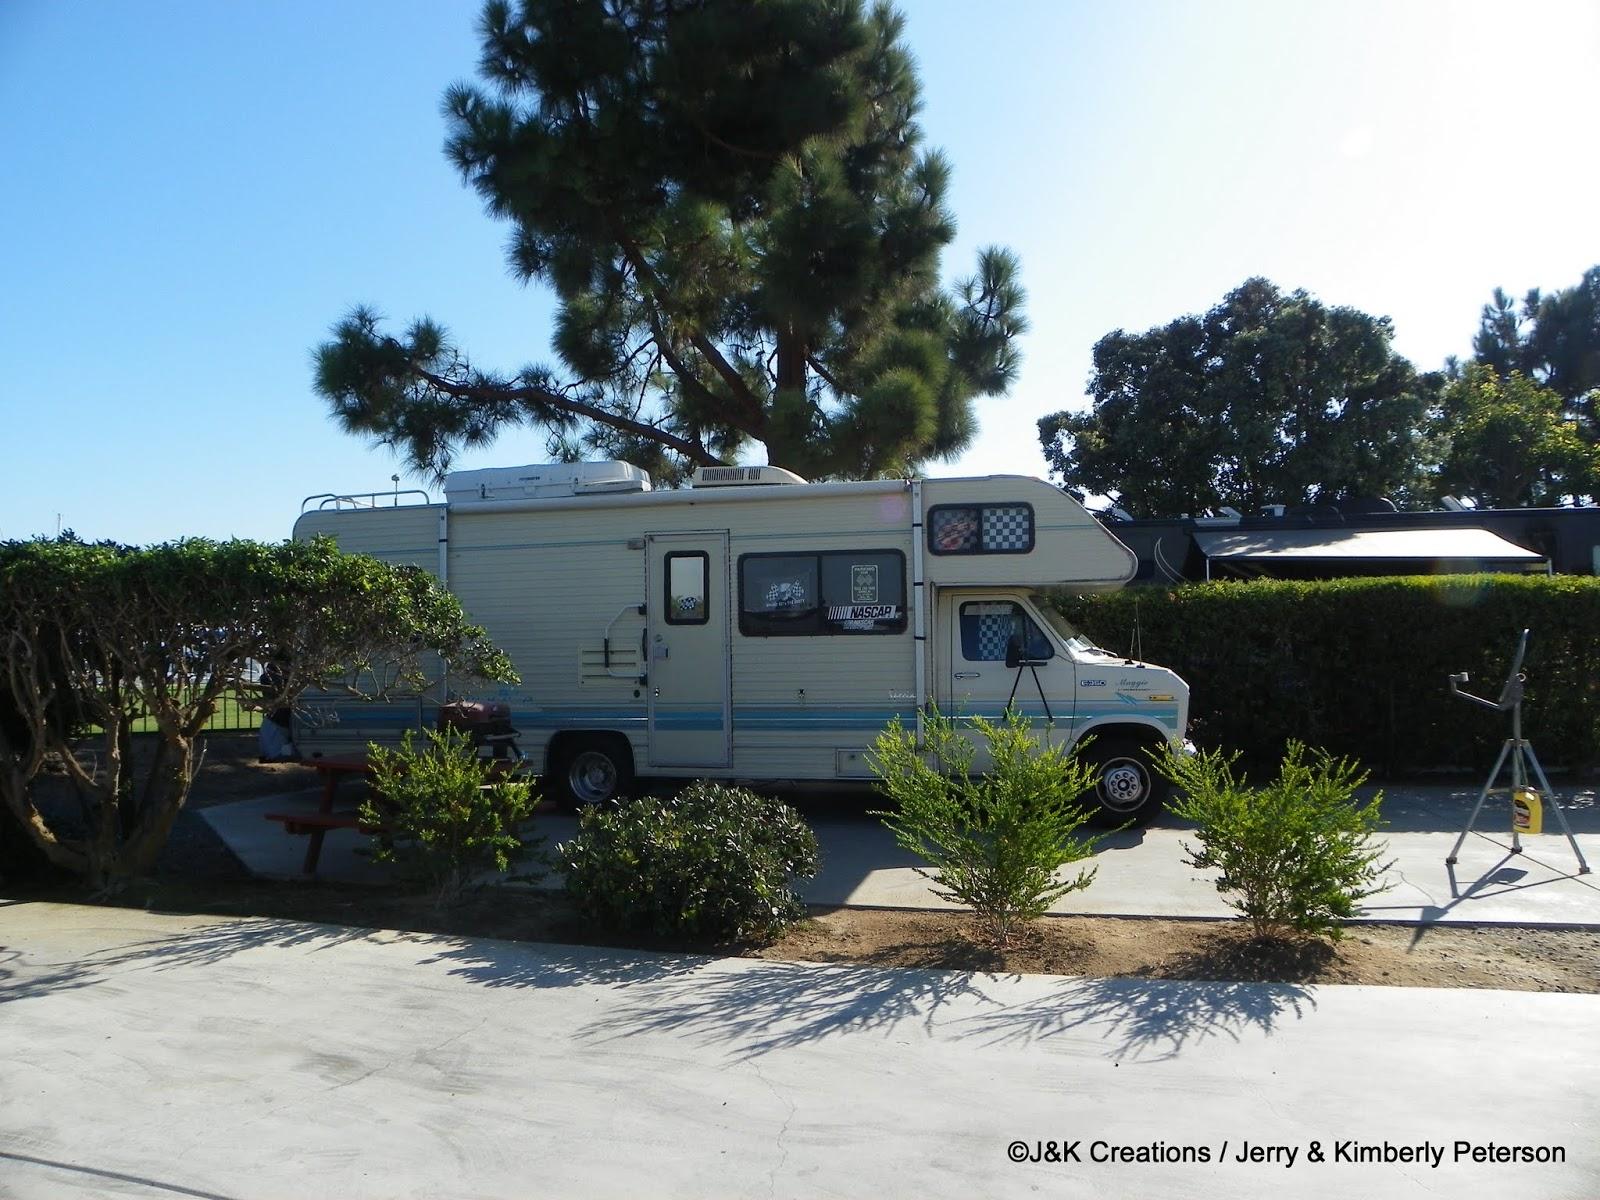 Chula Vista Rv Resort Special: Along The Way With J&K....: Chula Vista RV Resort